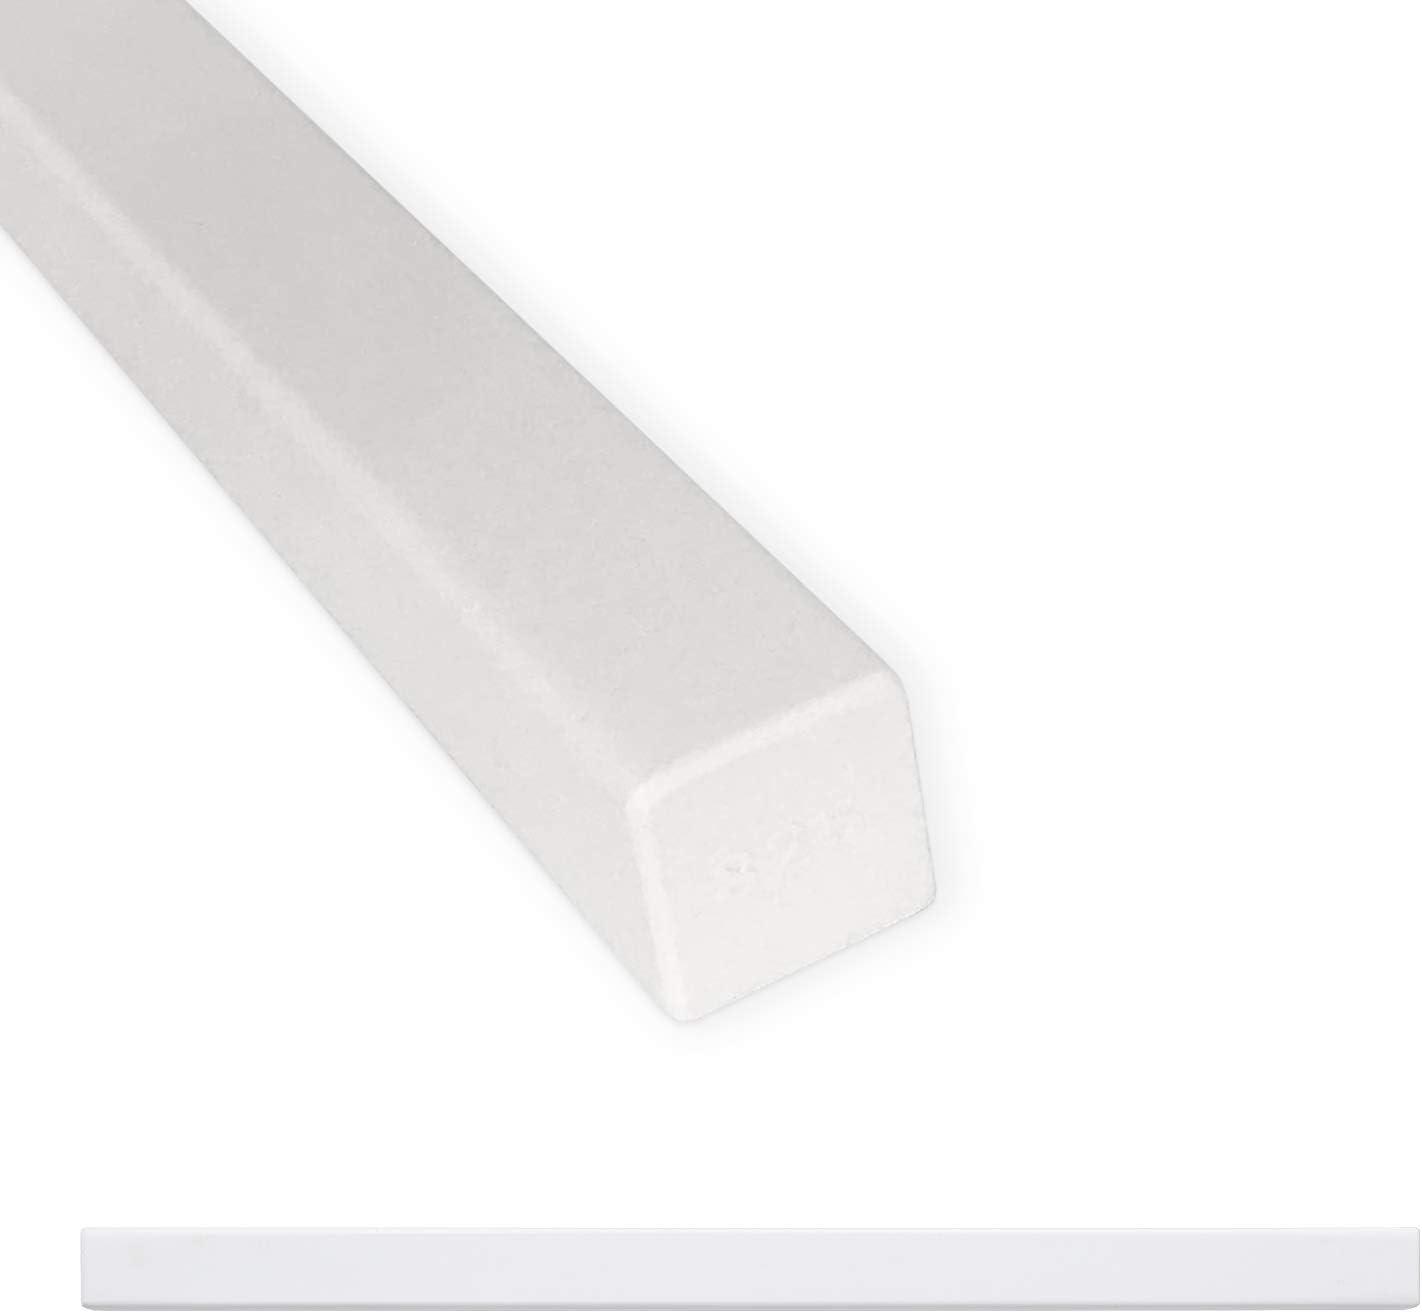 Tile Trim 3//4 x 12 inch Linear Flat Pencil Shower Edge Ceramic Tile Transition Liner Backsplash Wall Molding 12 Pack Graphite